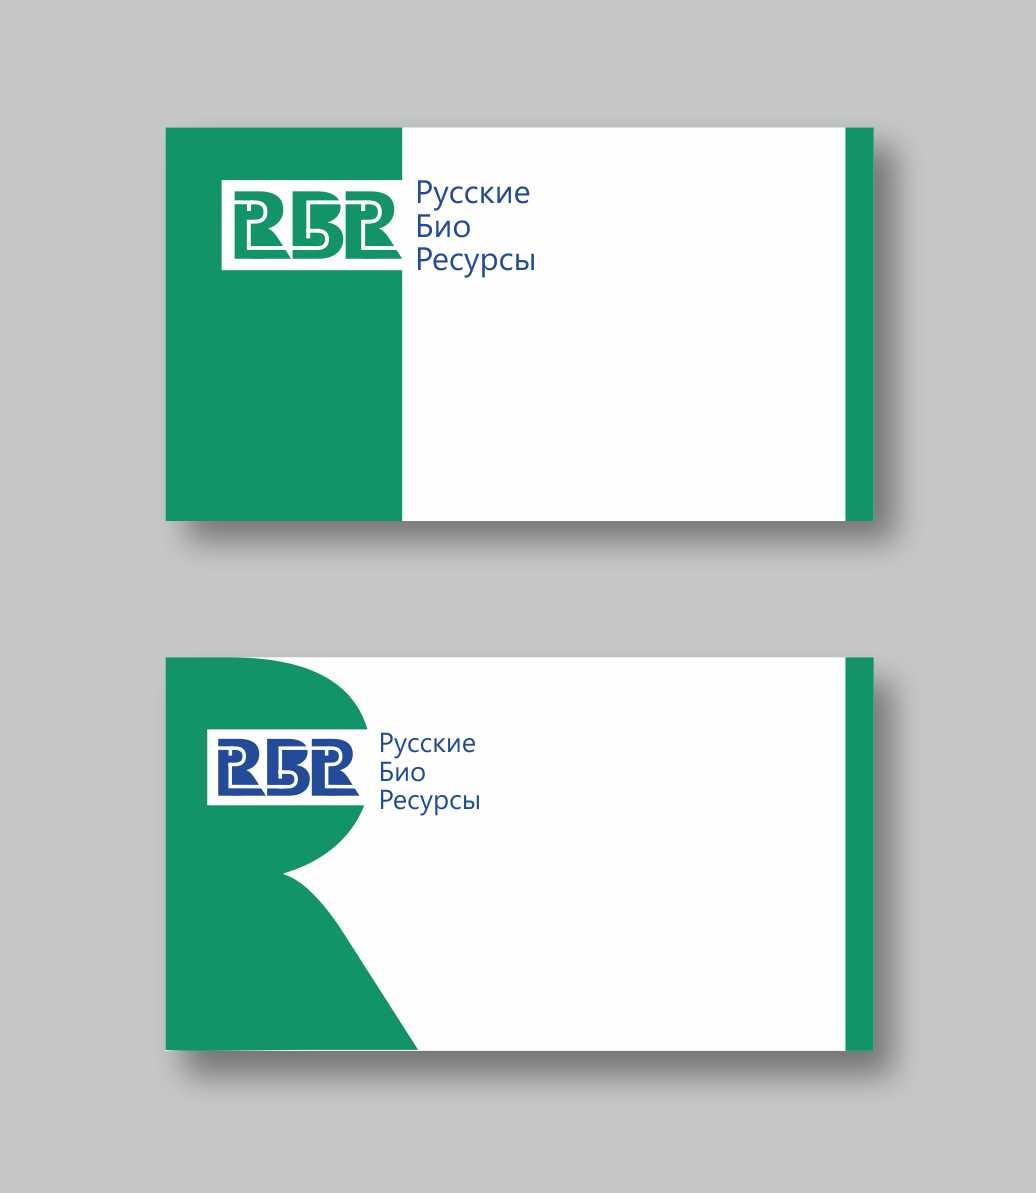 Разработка логотипа для компании «Русские Био Ресурсы» фото f_88458f79aab9fd08.jpg